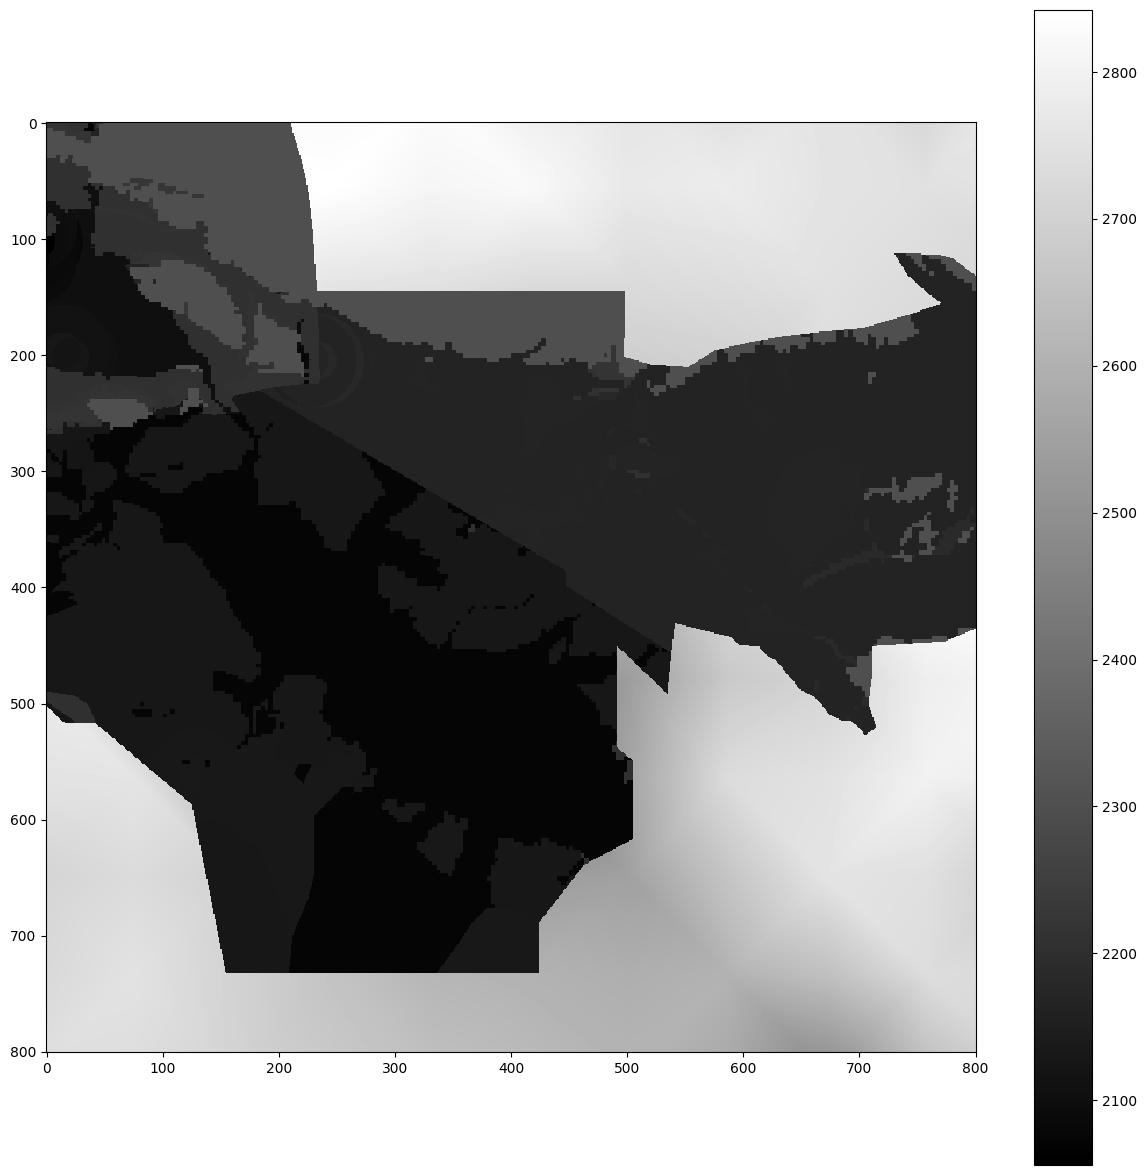 bench/seismic/wp/la_habra/meshes/velocity_model/plots/rho_50.png